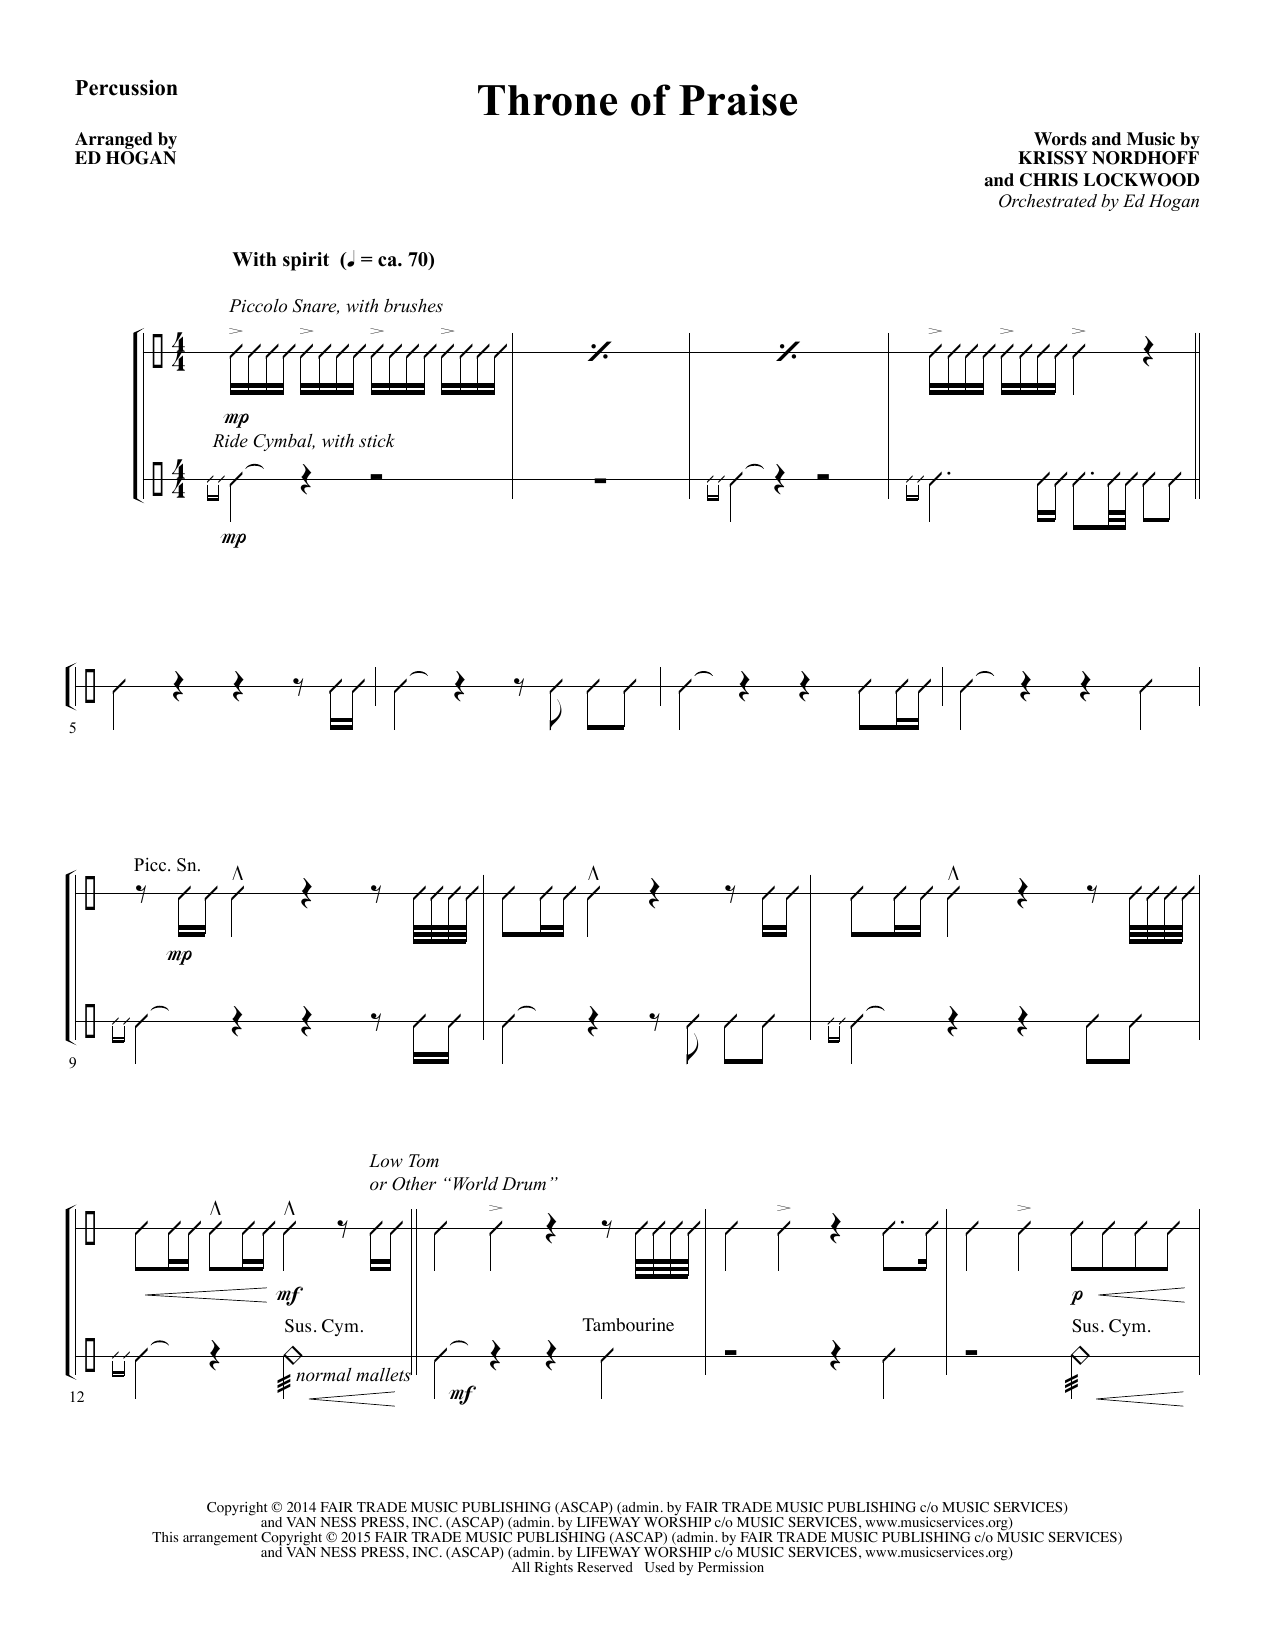 Throne of Praise - Percussion sheet music